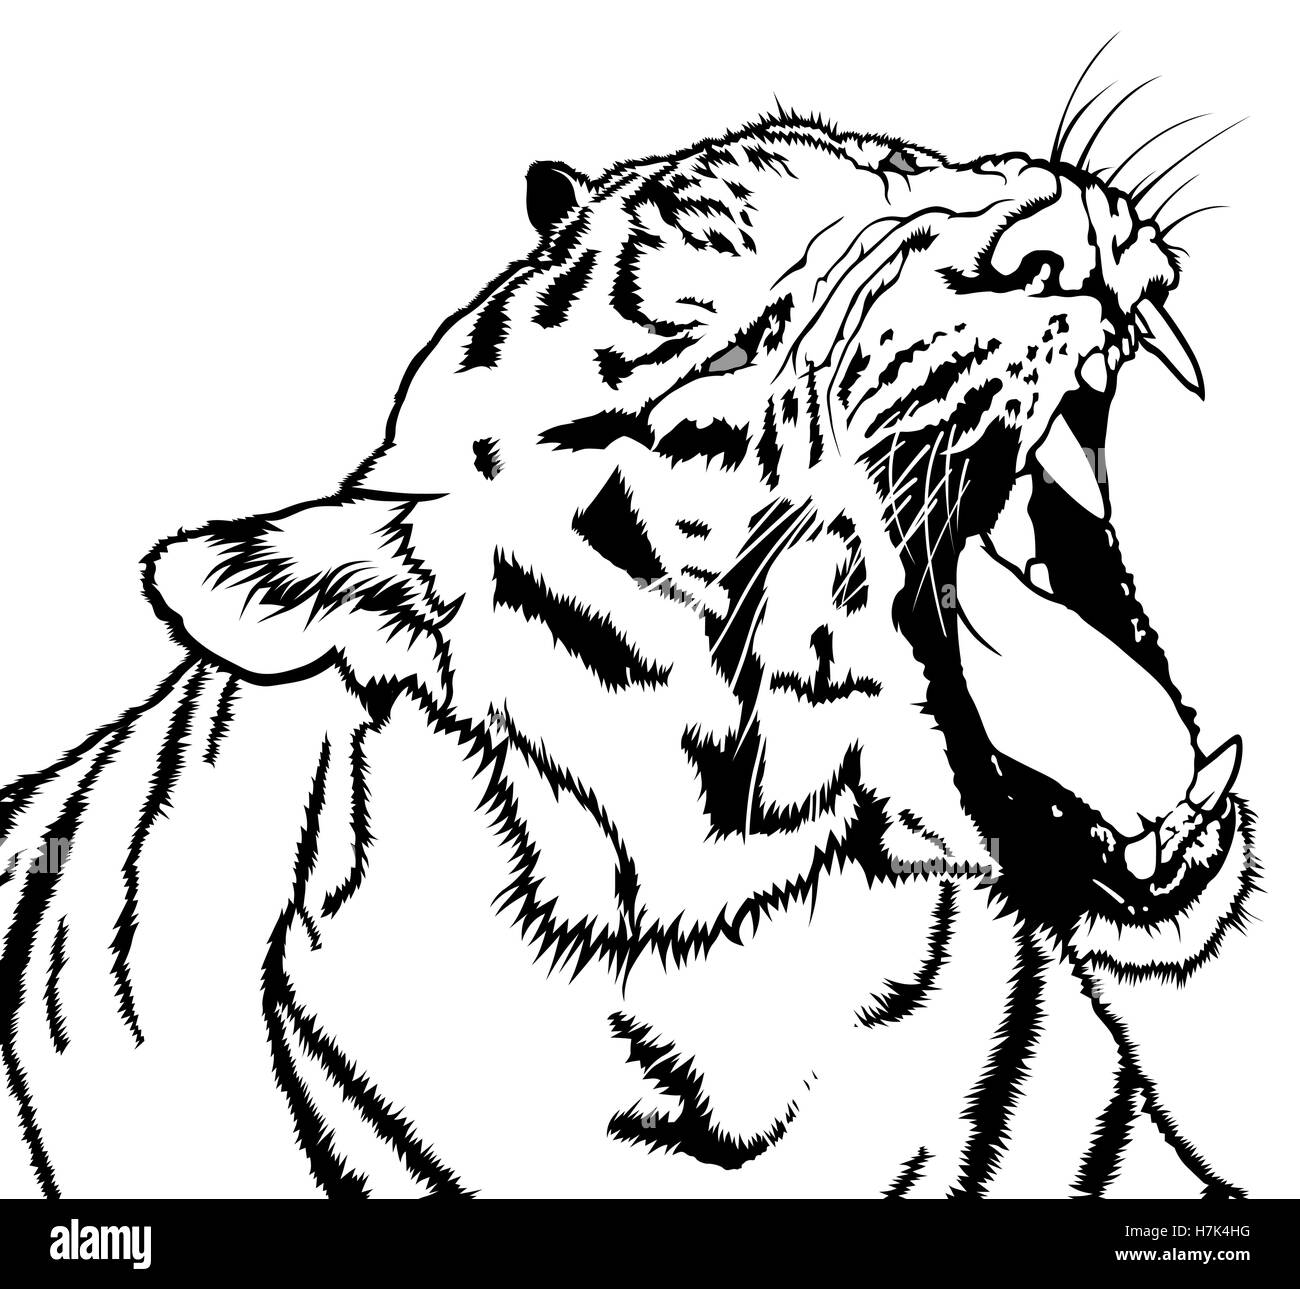 Roaring Tiger - Stock Image